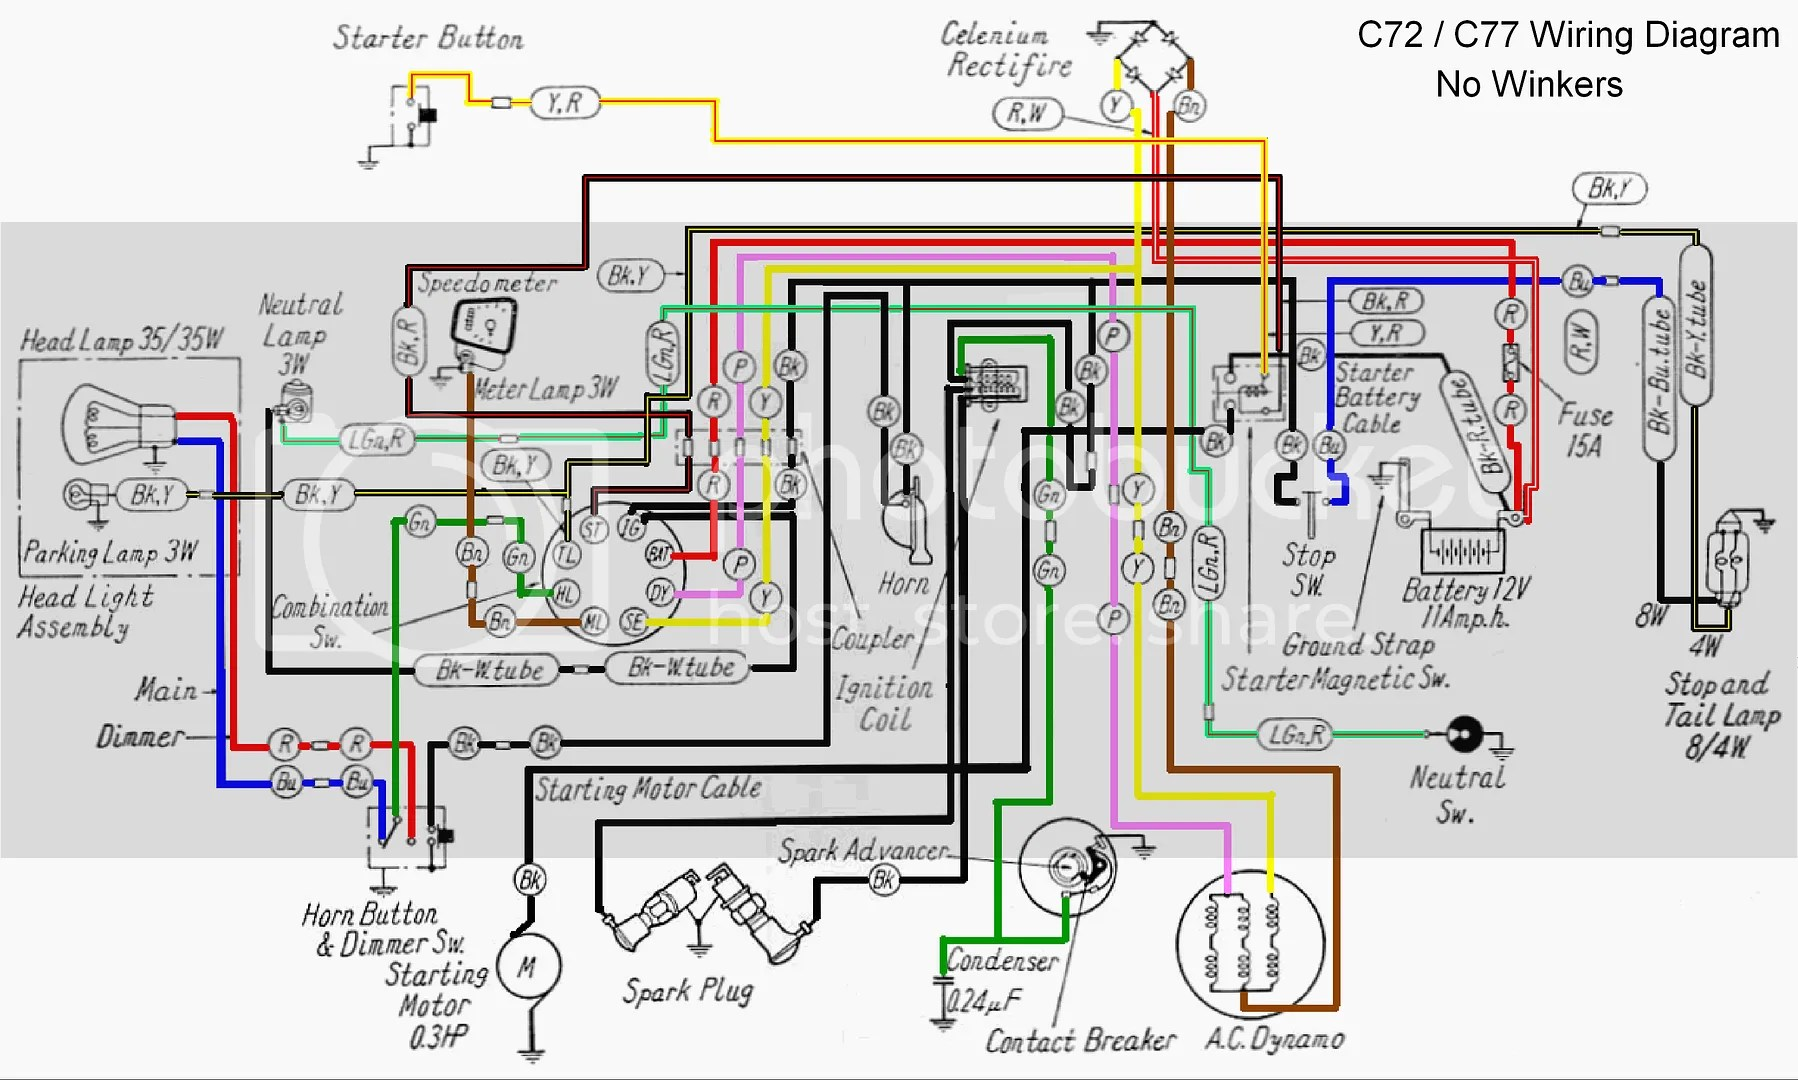 Wiring Diagram Of Honda Tmx 155 - honda tmx 155 service manual on